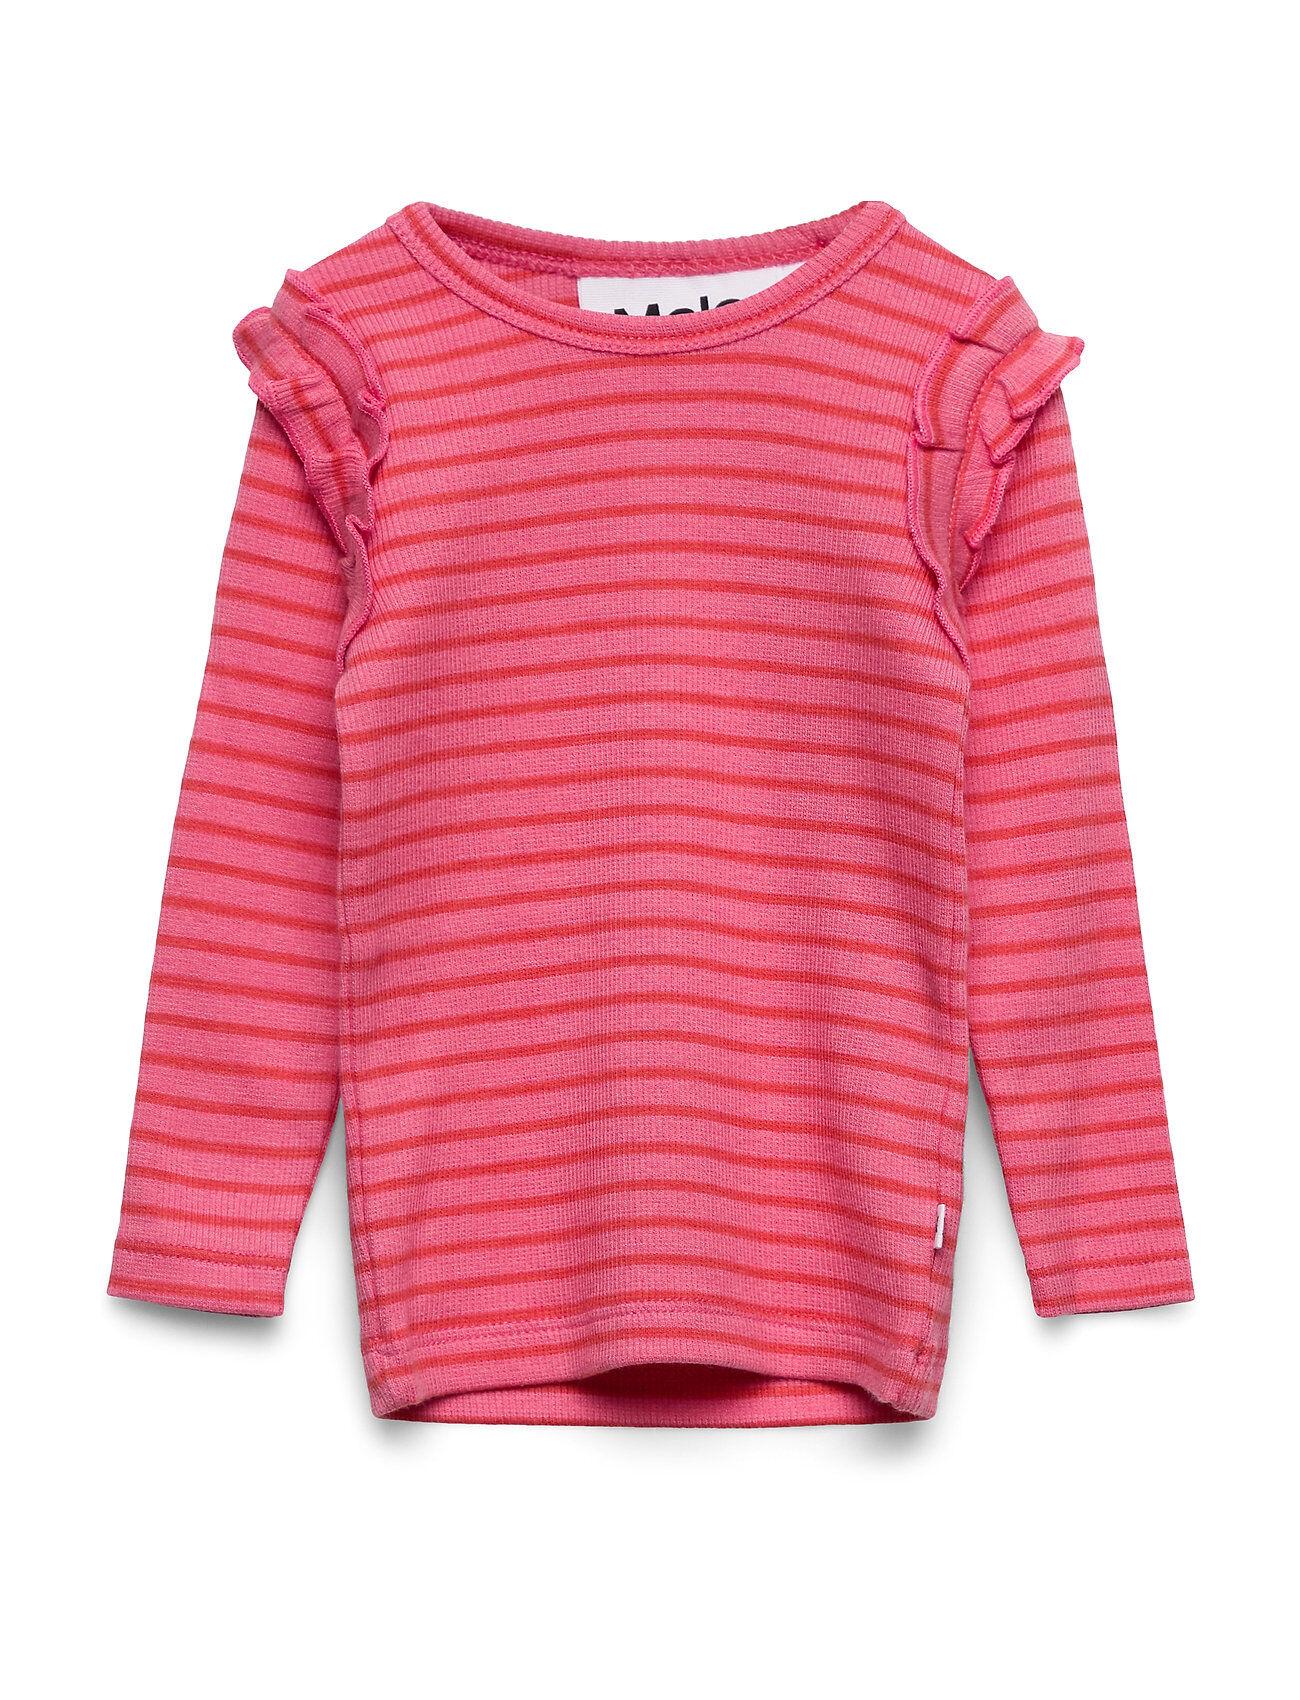 Molo Emma T-shirts Long-sleeved T-shirts Vaaleanpunainen Molo